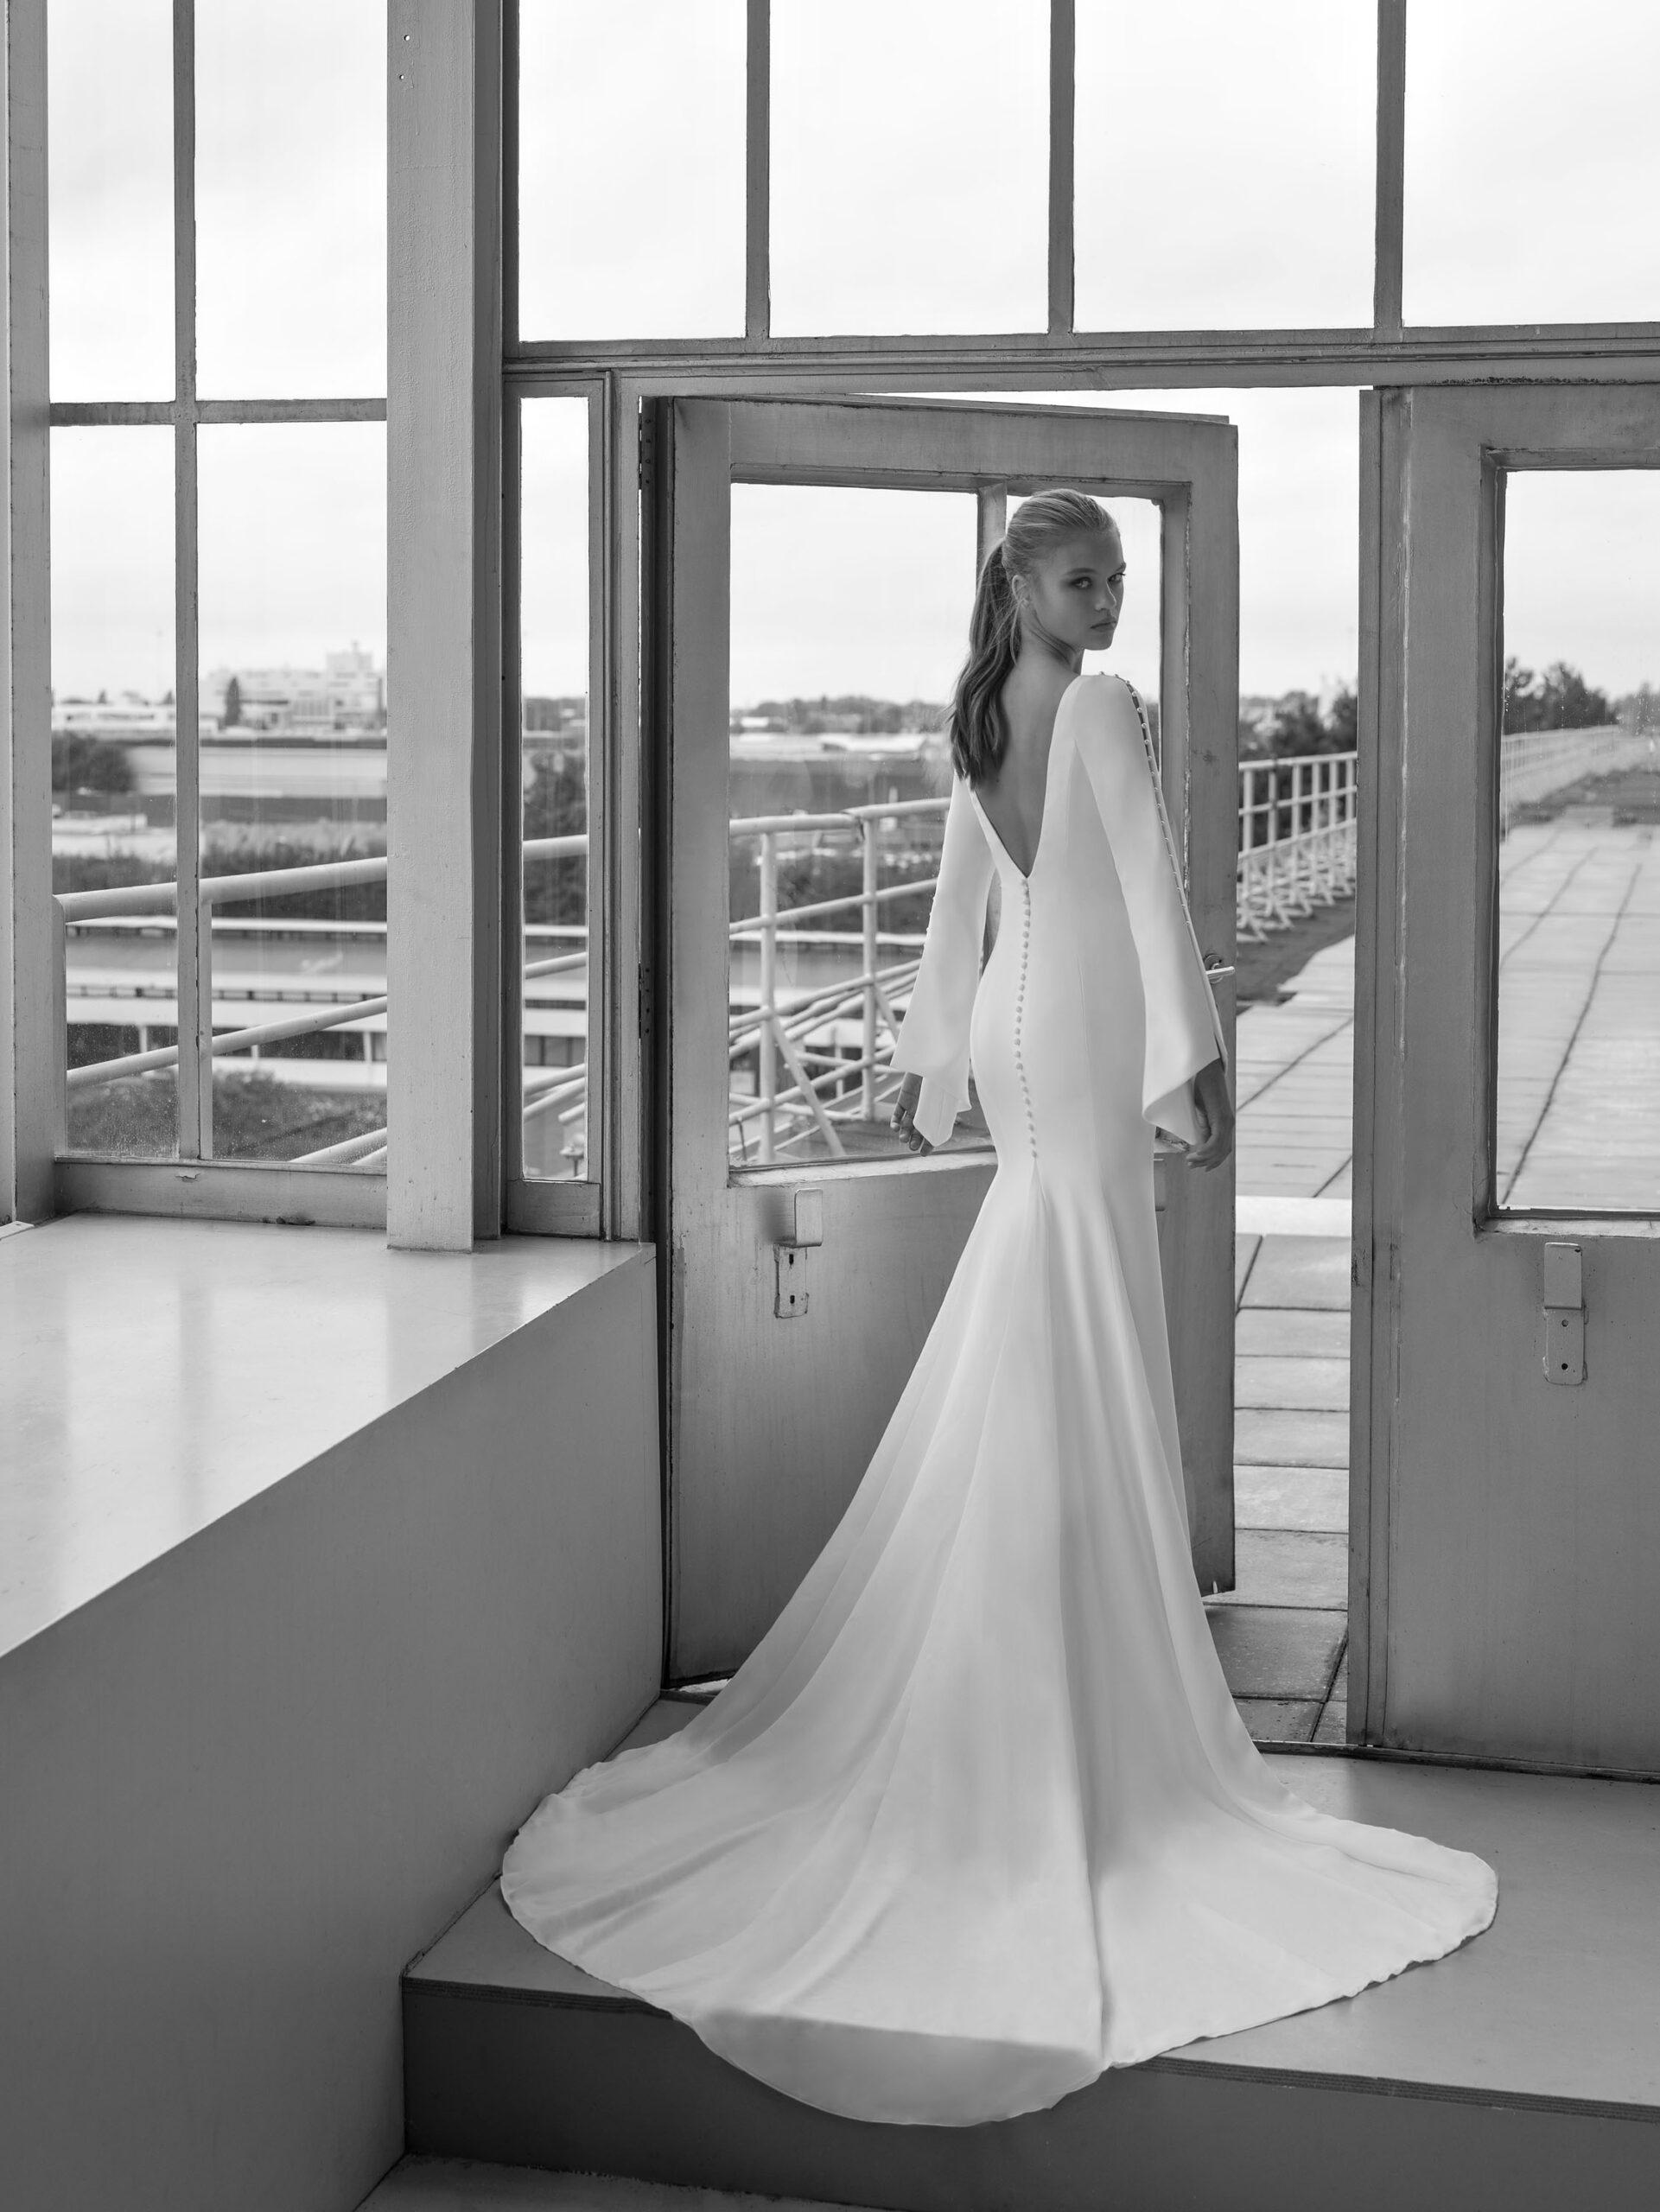 Bryllupskjole sort hvid